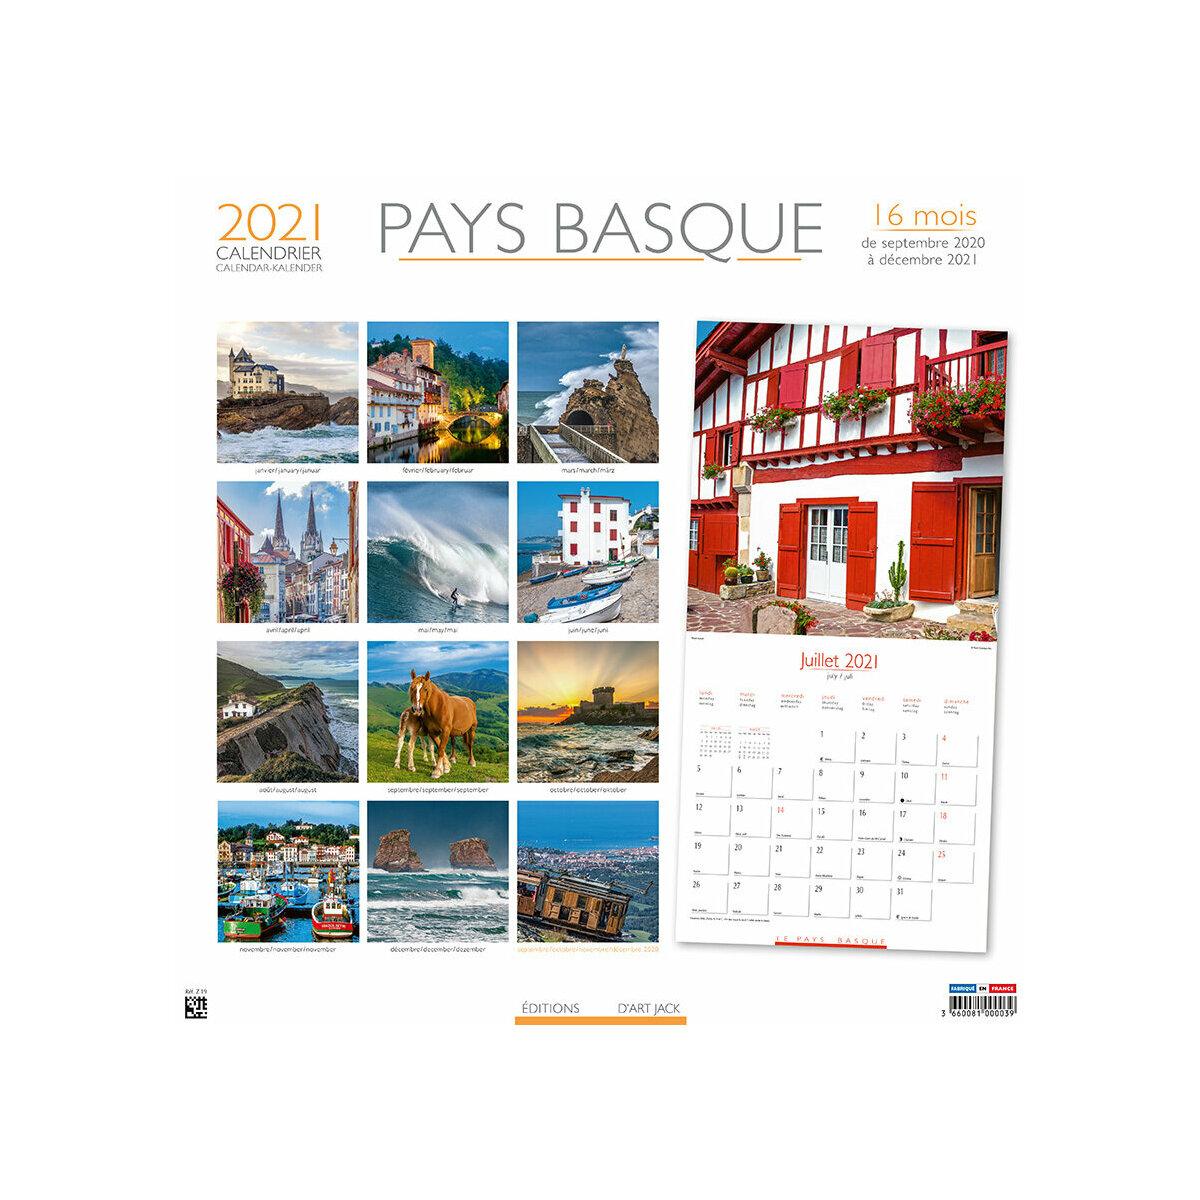 calendrier Pays basque 2021